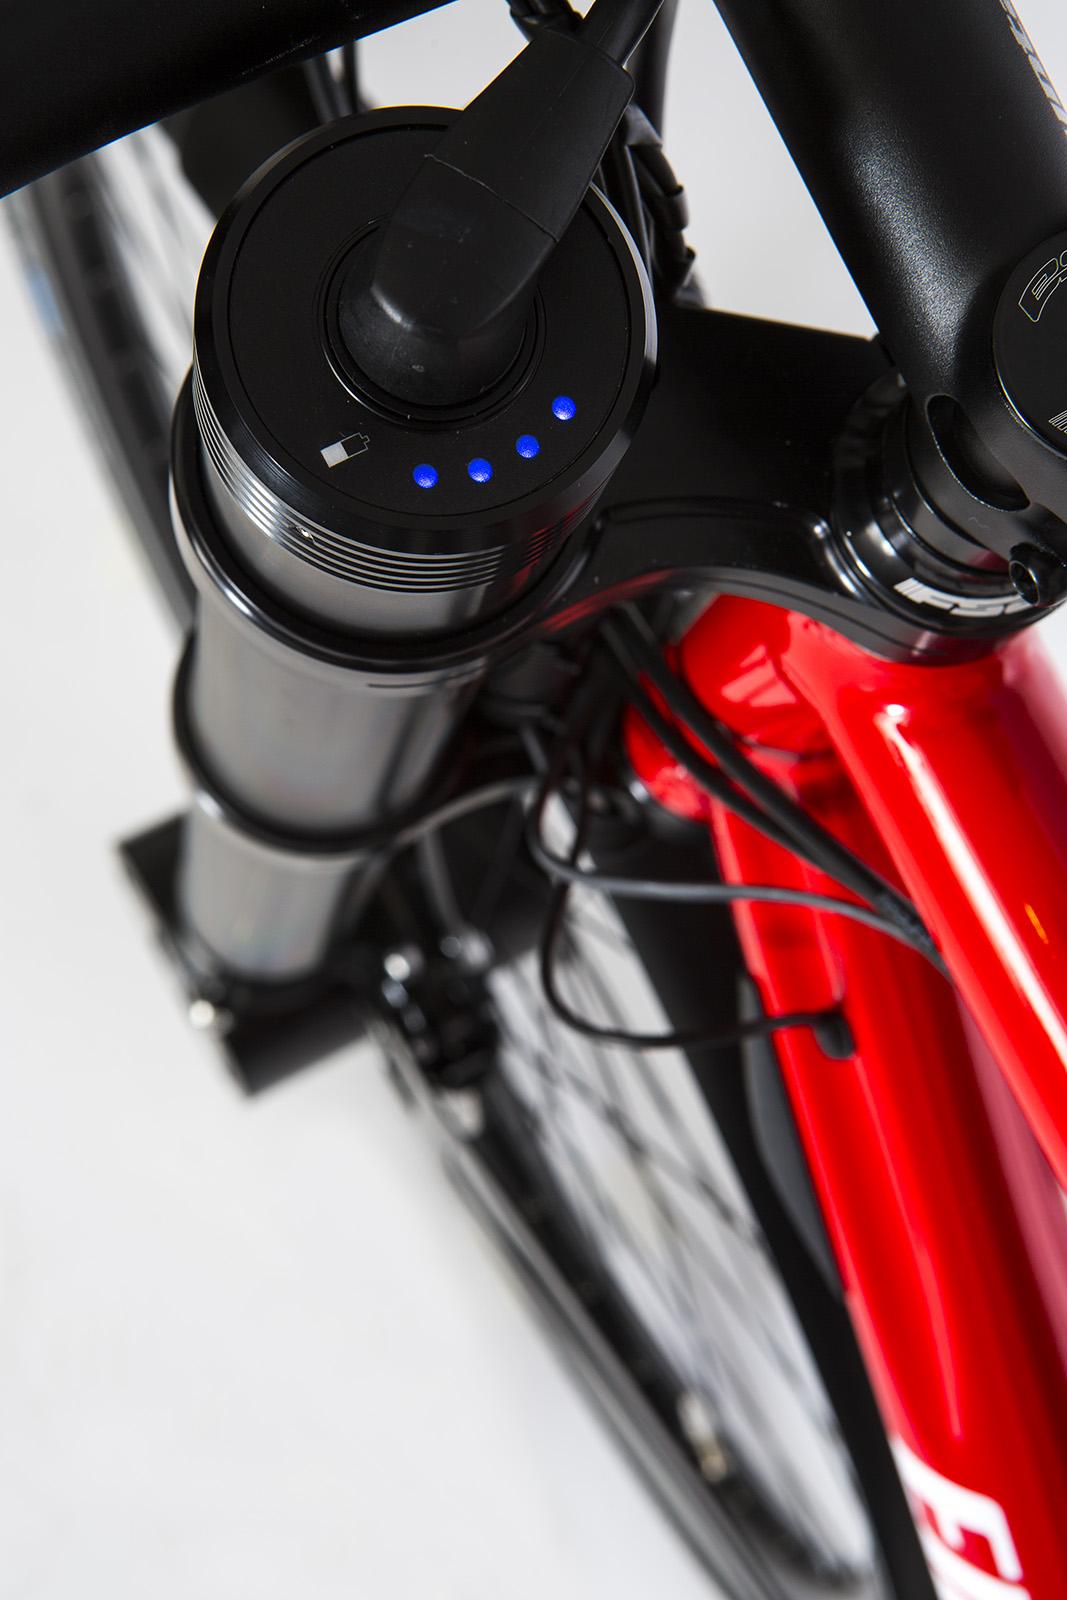 Electrolyte Brandstifter S5 E - Das bessere Tourenrad